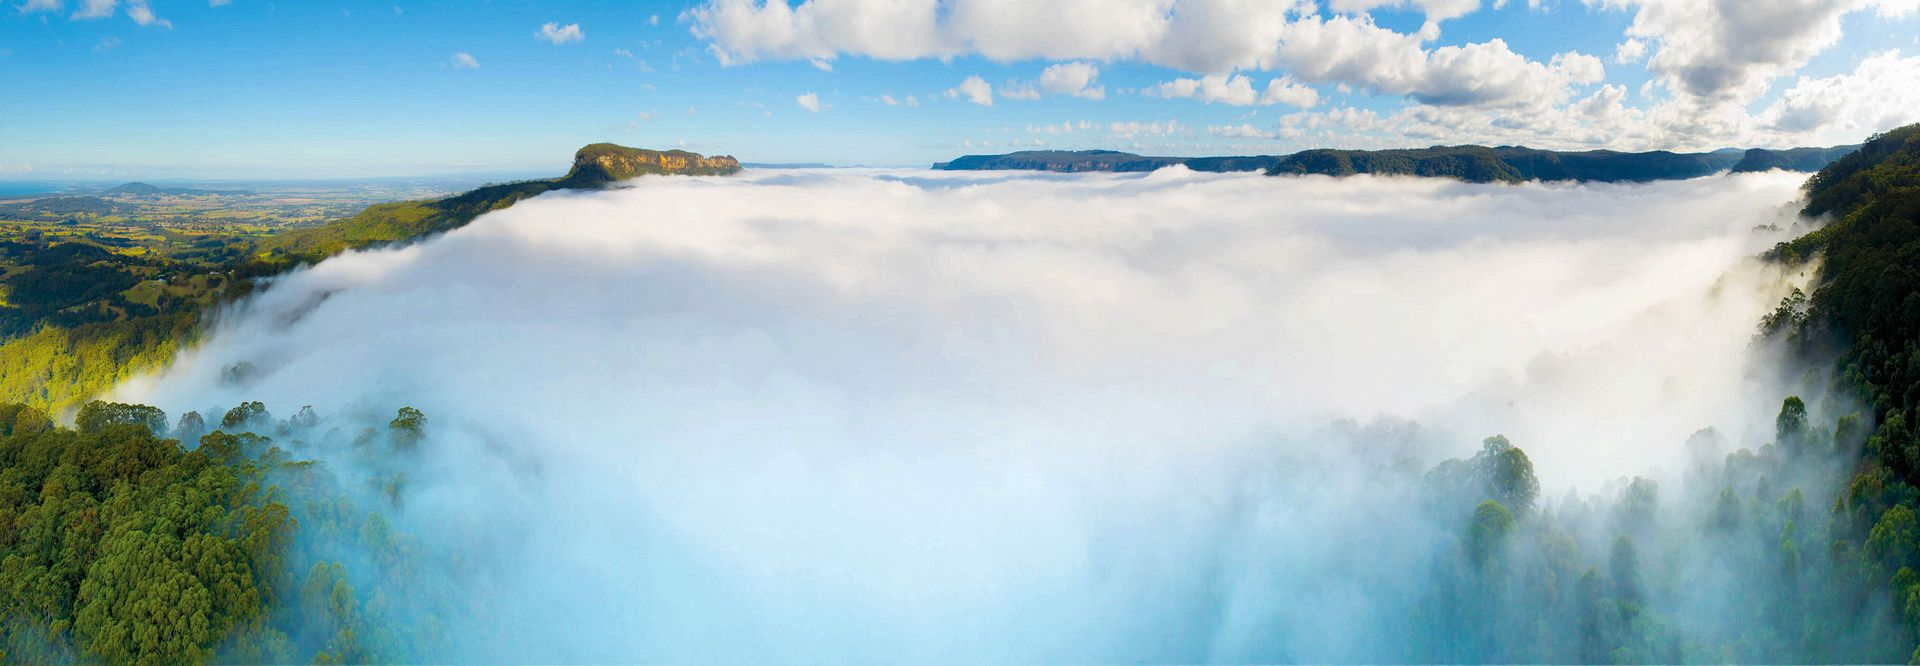 Fog Over Woodhill Gap